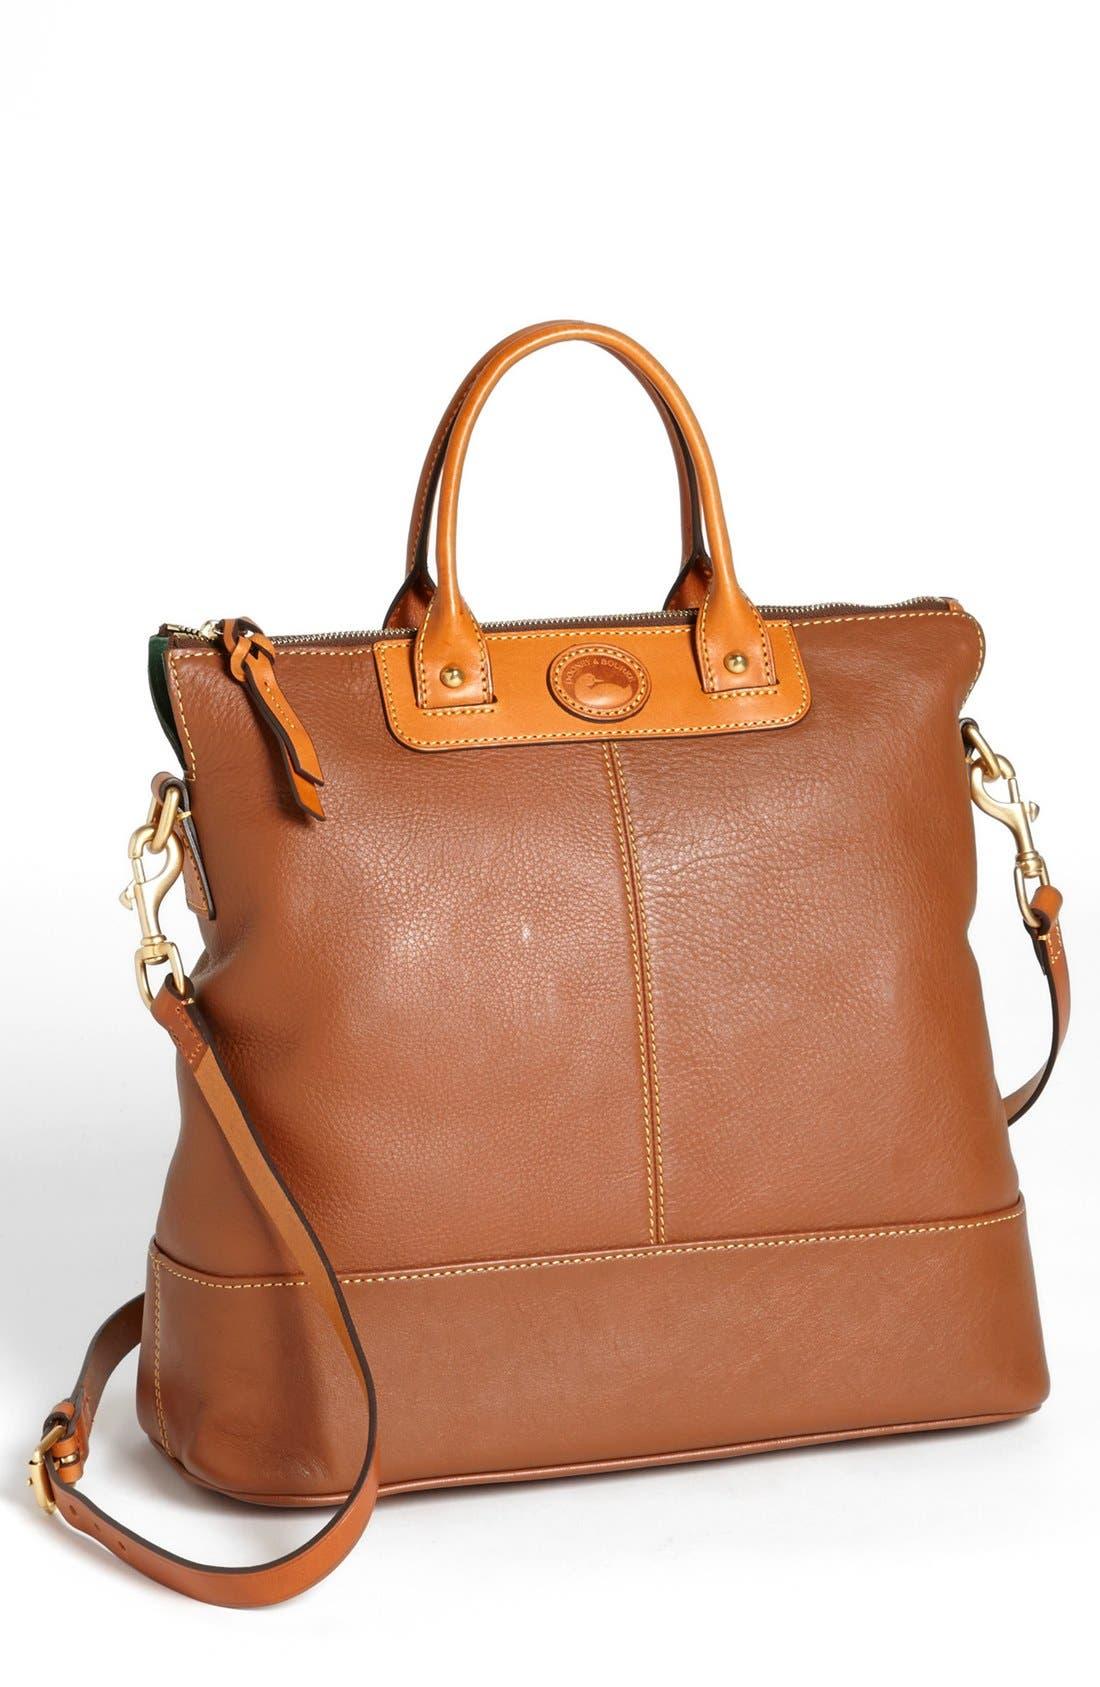 Main Image - Dooney & Bourke Convertible Shopper